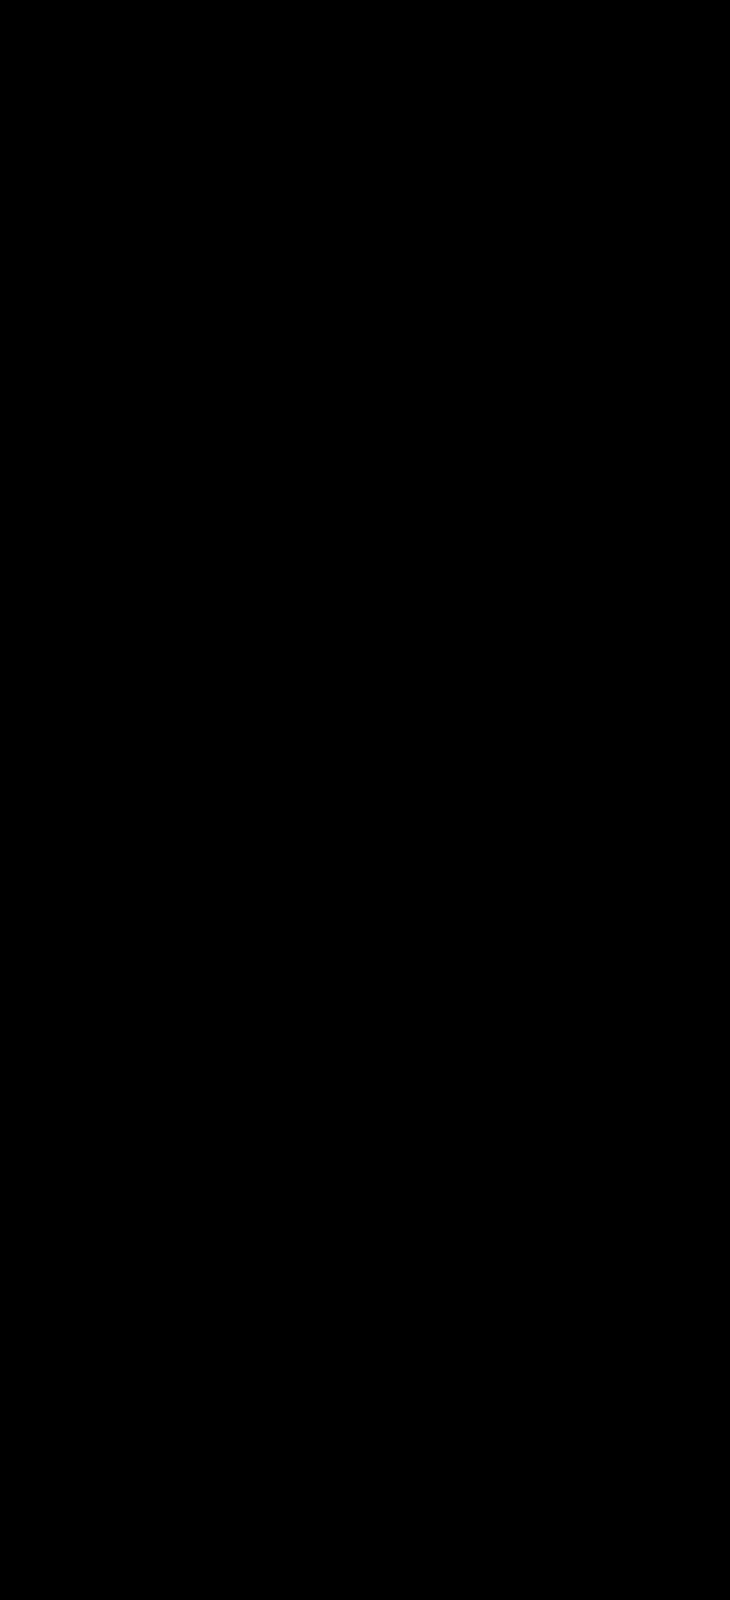 Melonheadz LDS illustrating: April 2013